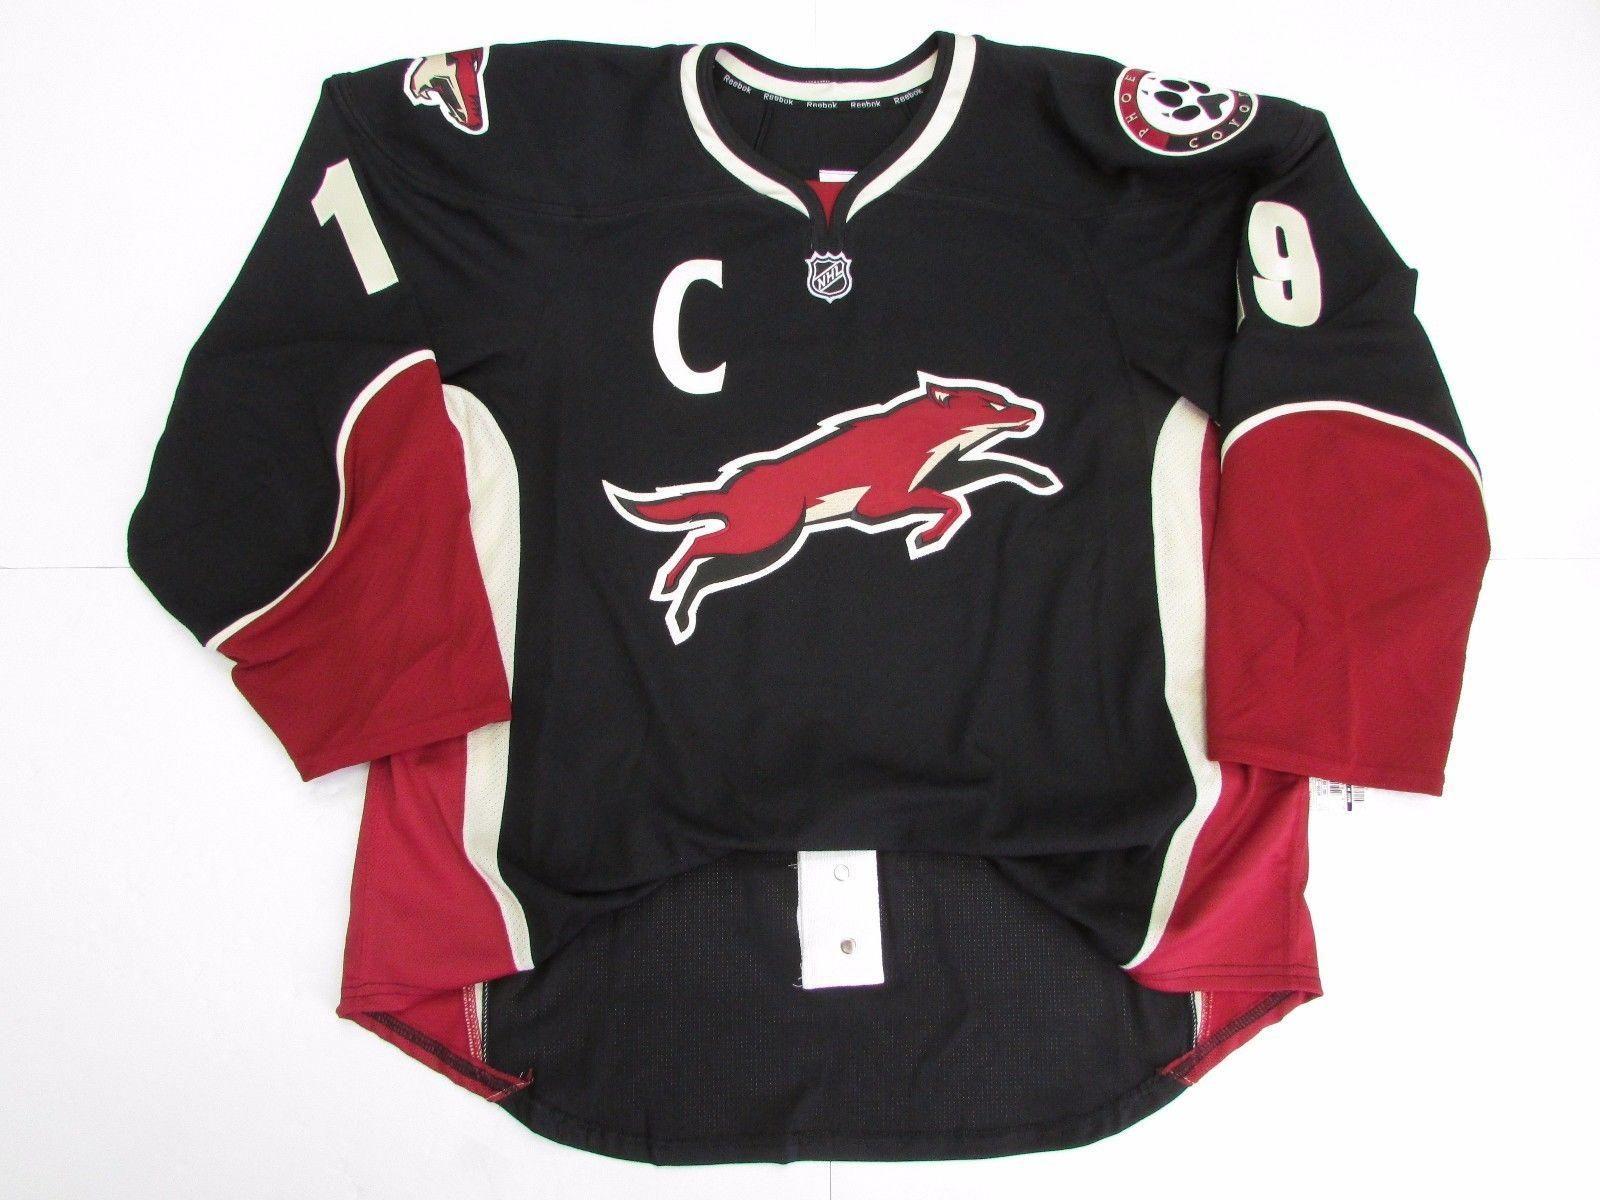 c20992c8c 2019 Cheap Custom SHANE DOAN PHOENIX COYOTES THIRD HOCKEY JERSEY Stitch Add Any  Number Any Name Mens Hockey Jersey XS 5XL From Customsportsjersey